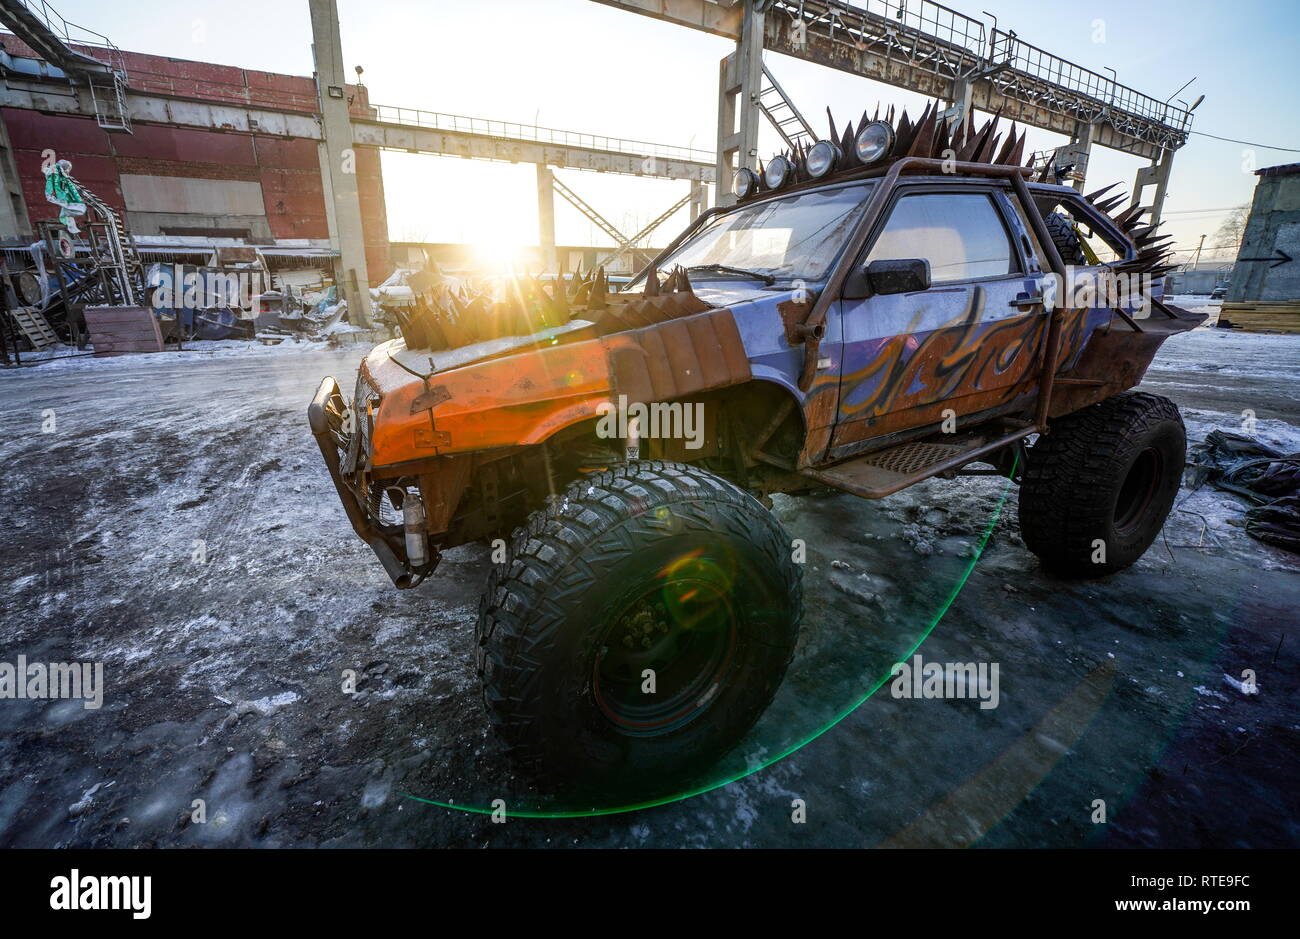 Irkutsk, Russia. 21st Feb, 2019. IRKUTSK, RUSSIA - FEBRUARY 21, 2019: A vehicle custom tuned by car mechanic Roman Nikitin (nont in picture) in the post apocalyptic style. Alyona Shatuyeva/TASS Credit: ITAR-TASS News Agency/Alamy Live News - Stock Image